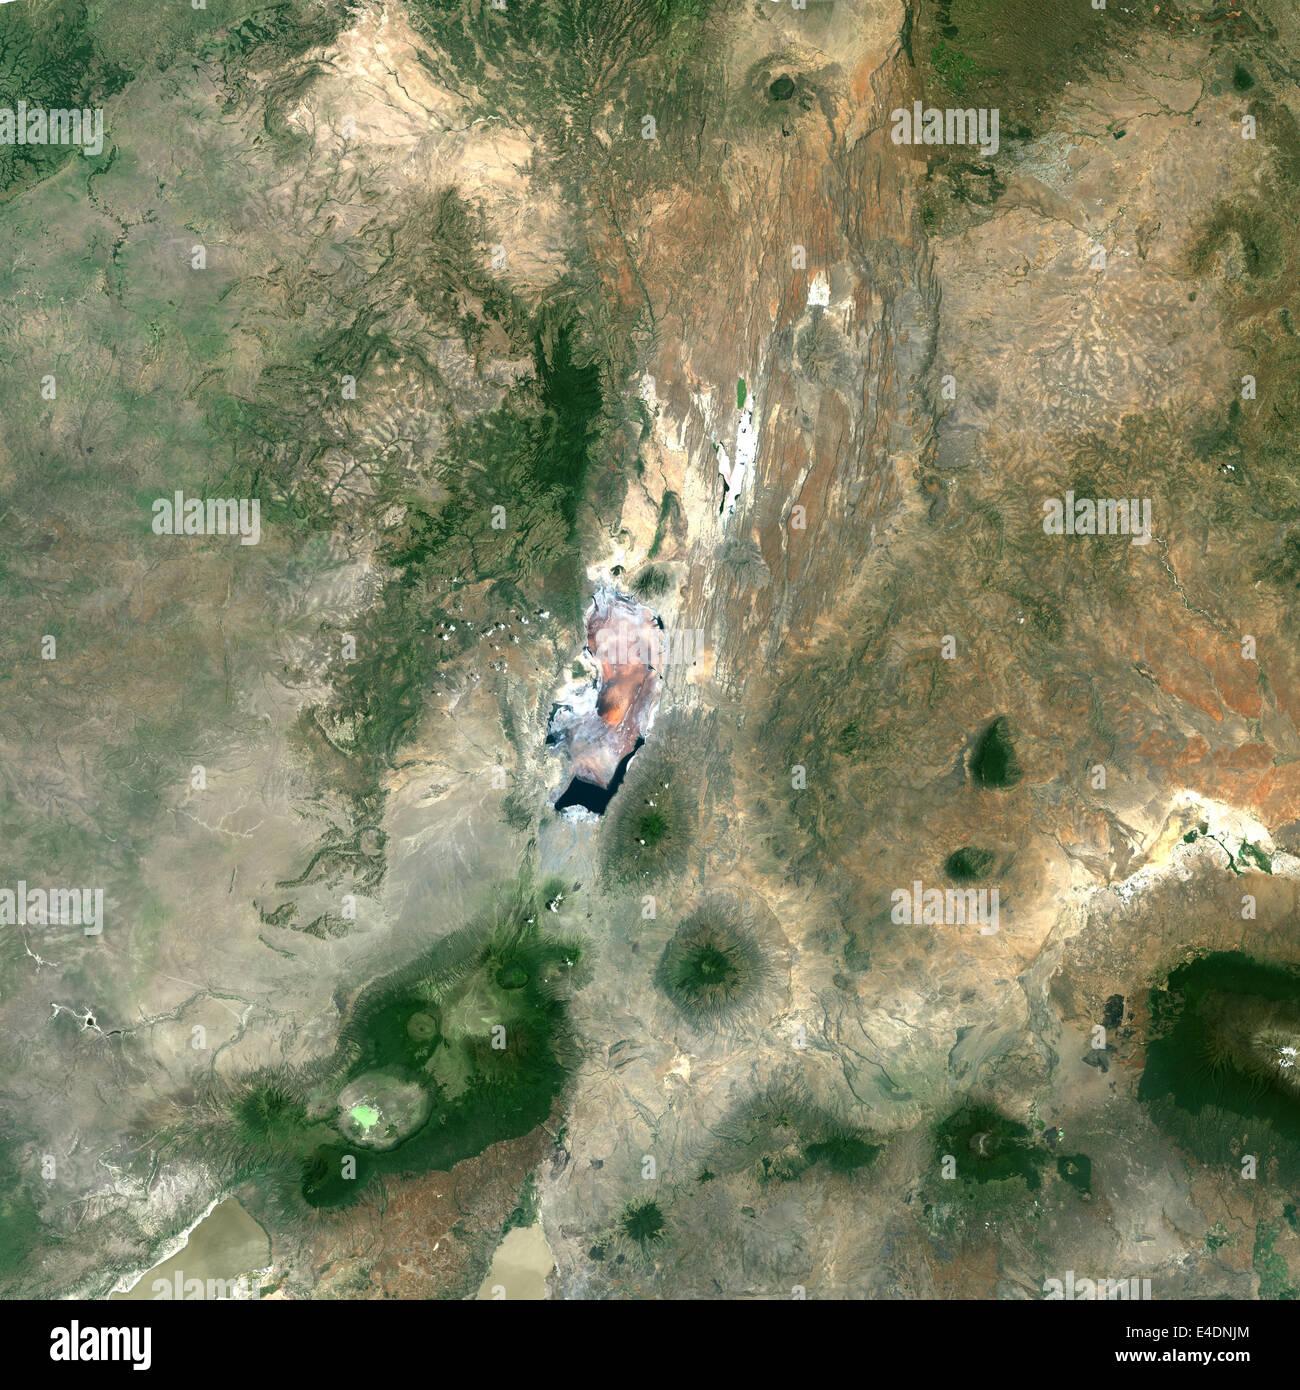 Ol Doinyo Lengai Volcano, Tanzania, True Colour Satellite Image. Lengai, Tanzanie, true colour satellite image. - Stock Image